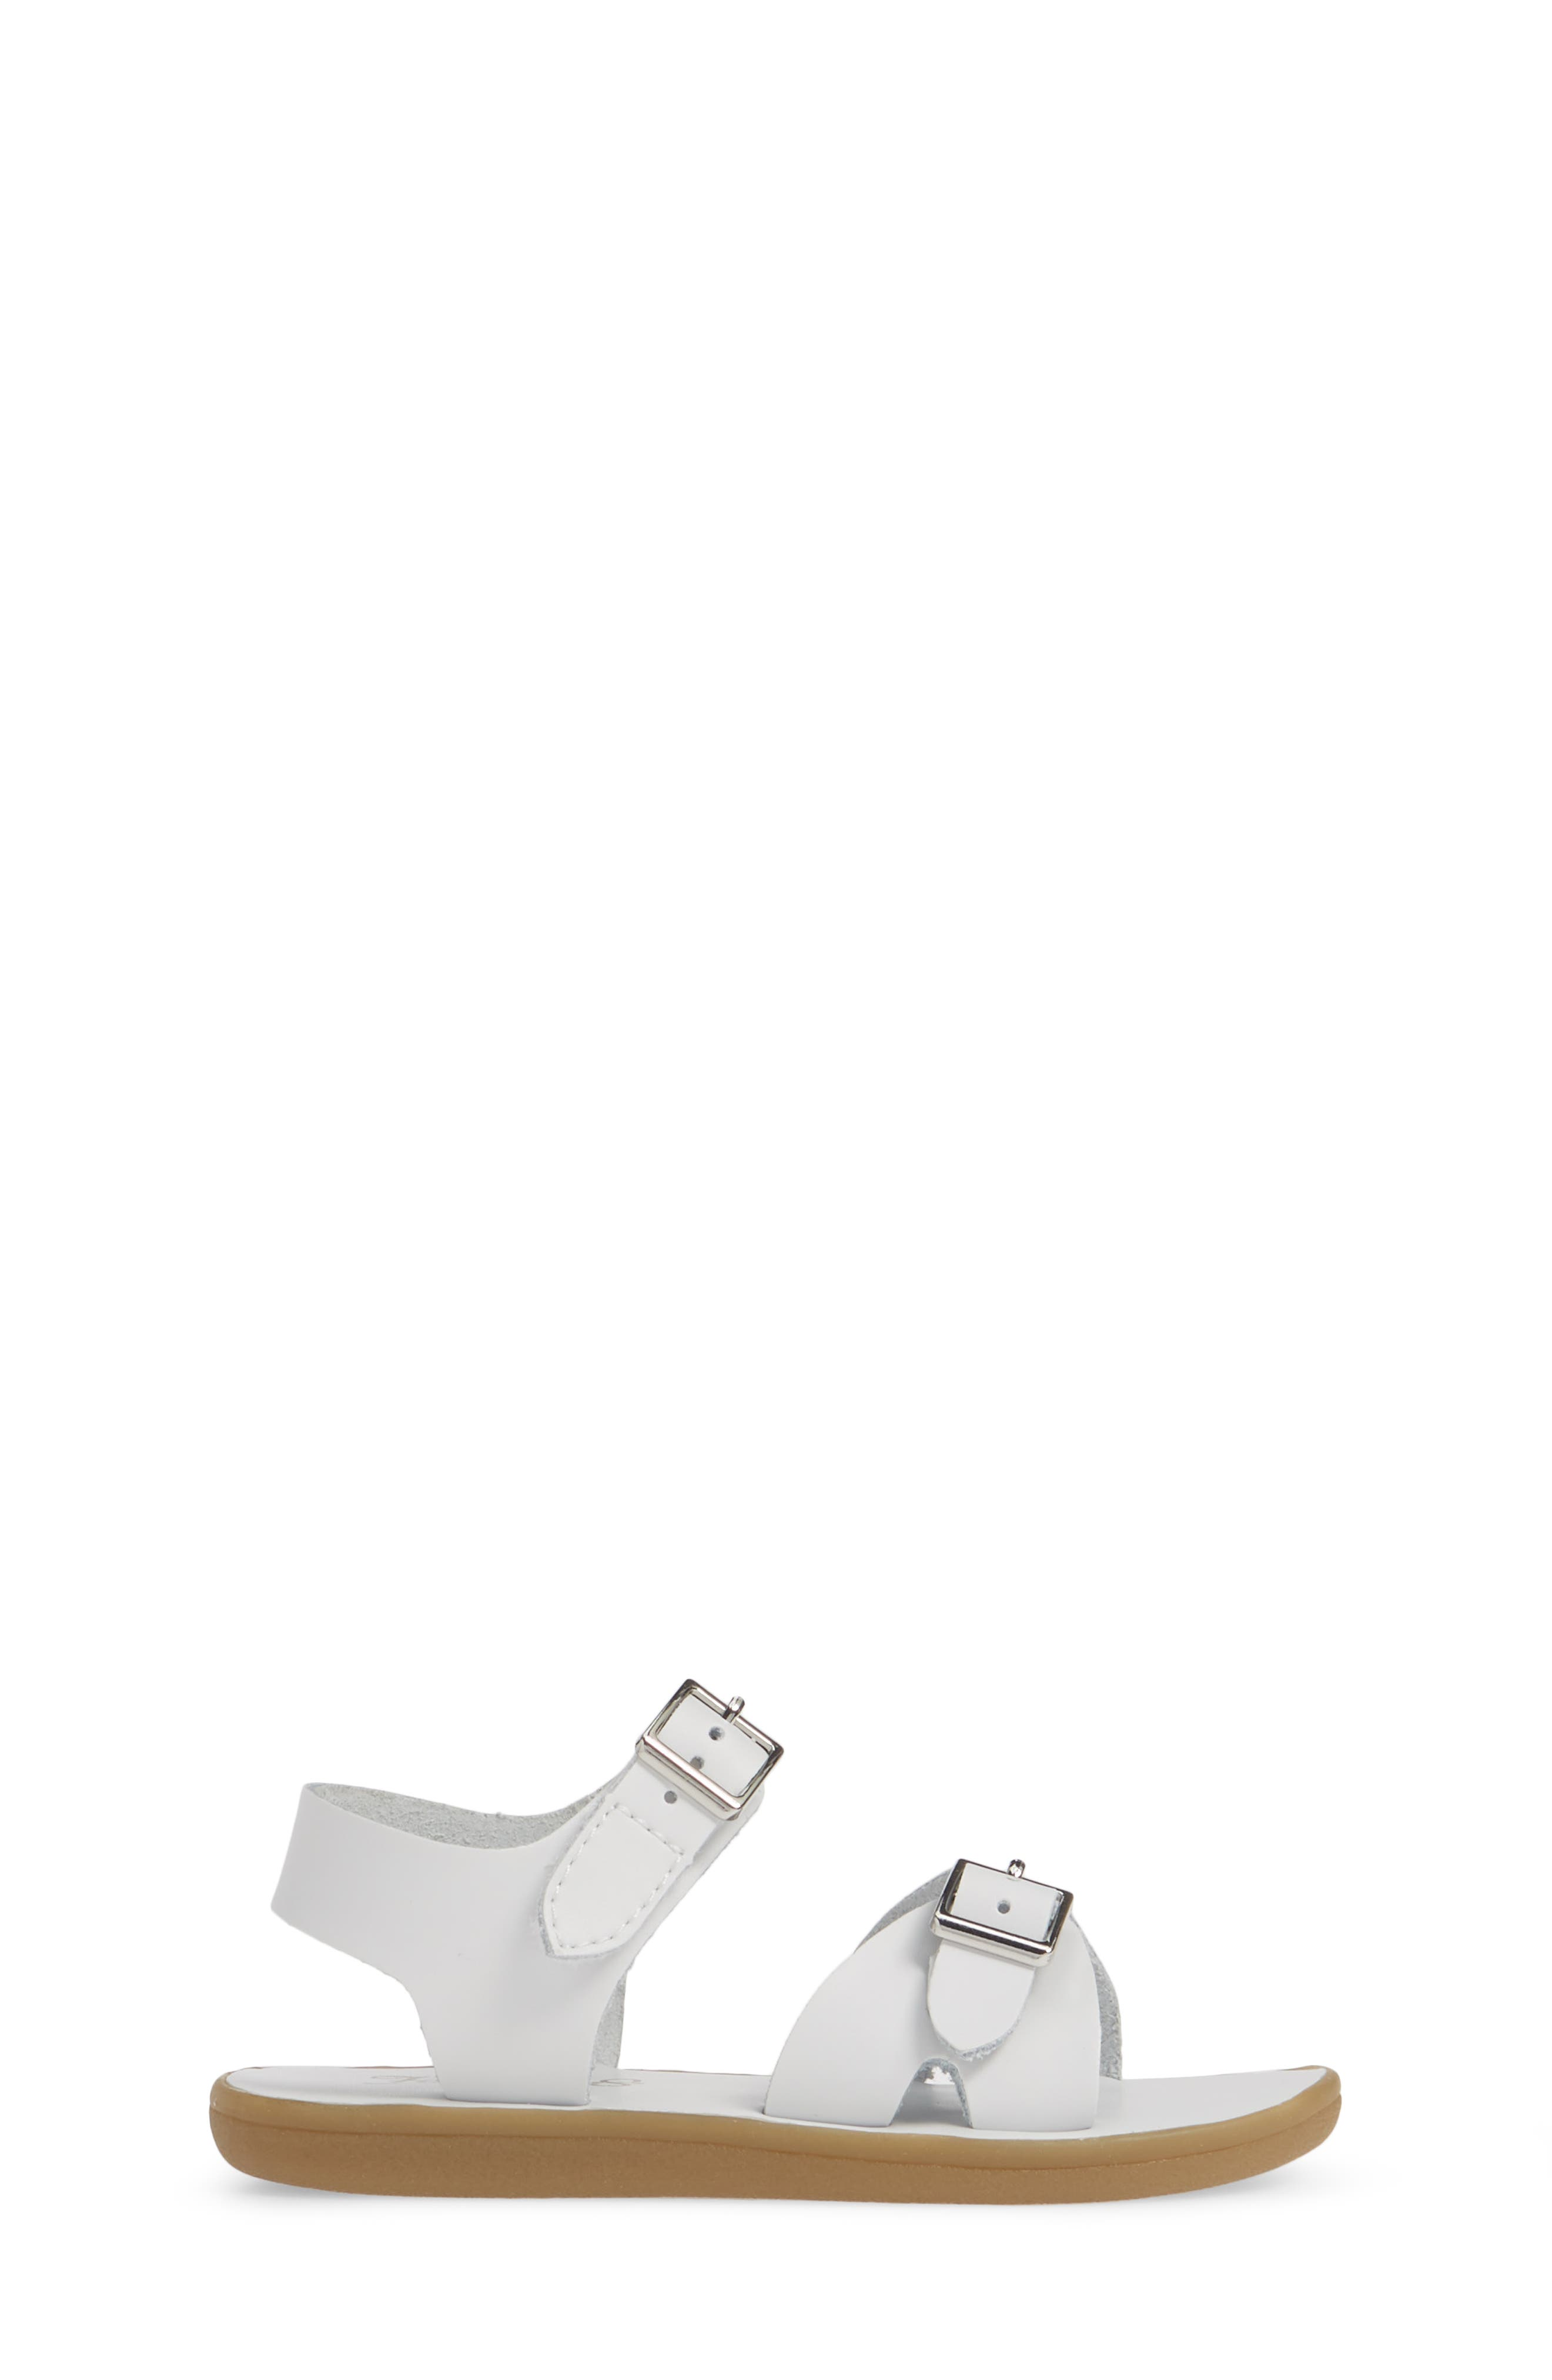 FOOTMATES, Tide Waterproof Sandal, Alternate thumbnail 3, color, WHITE